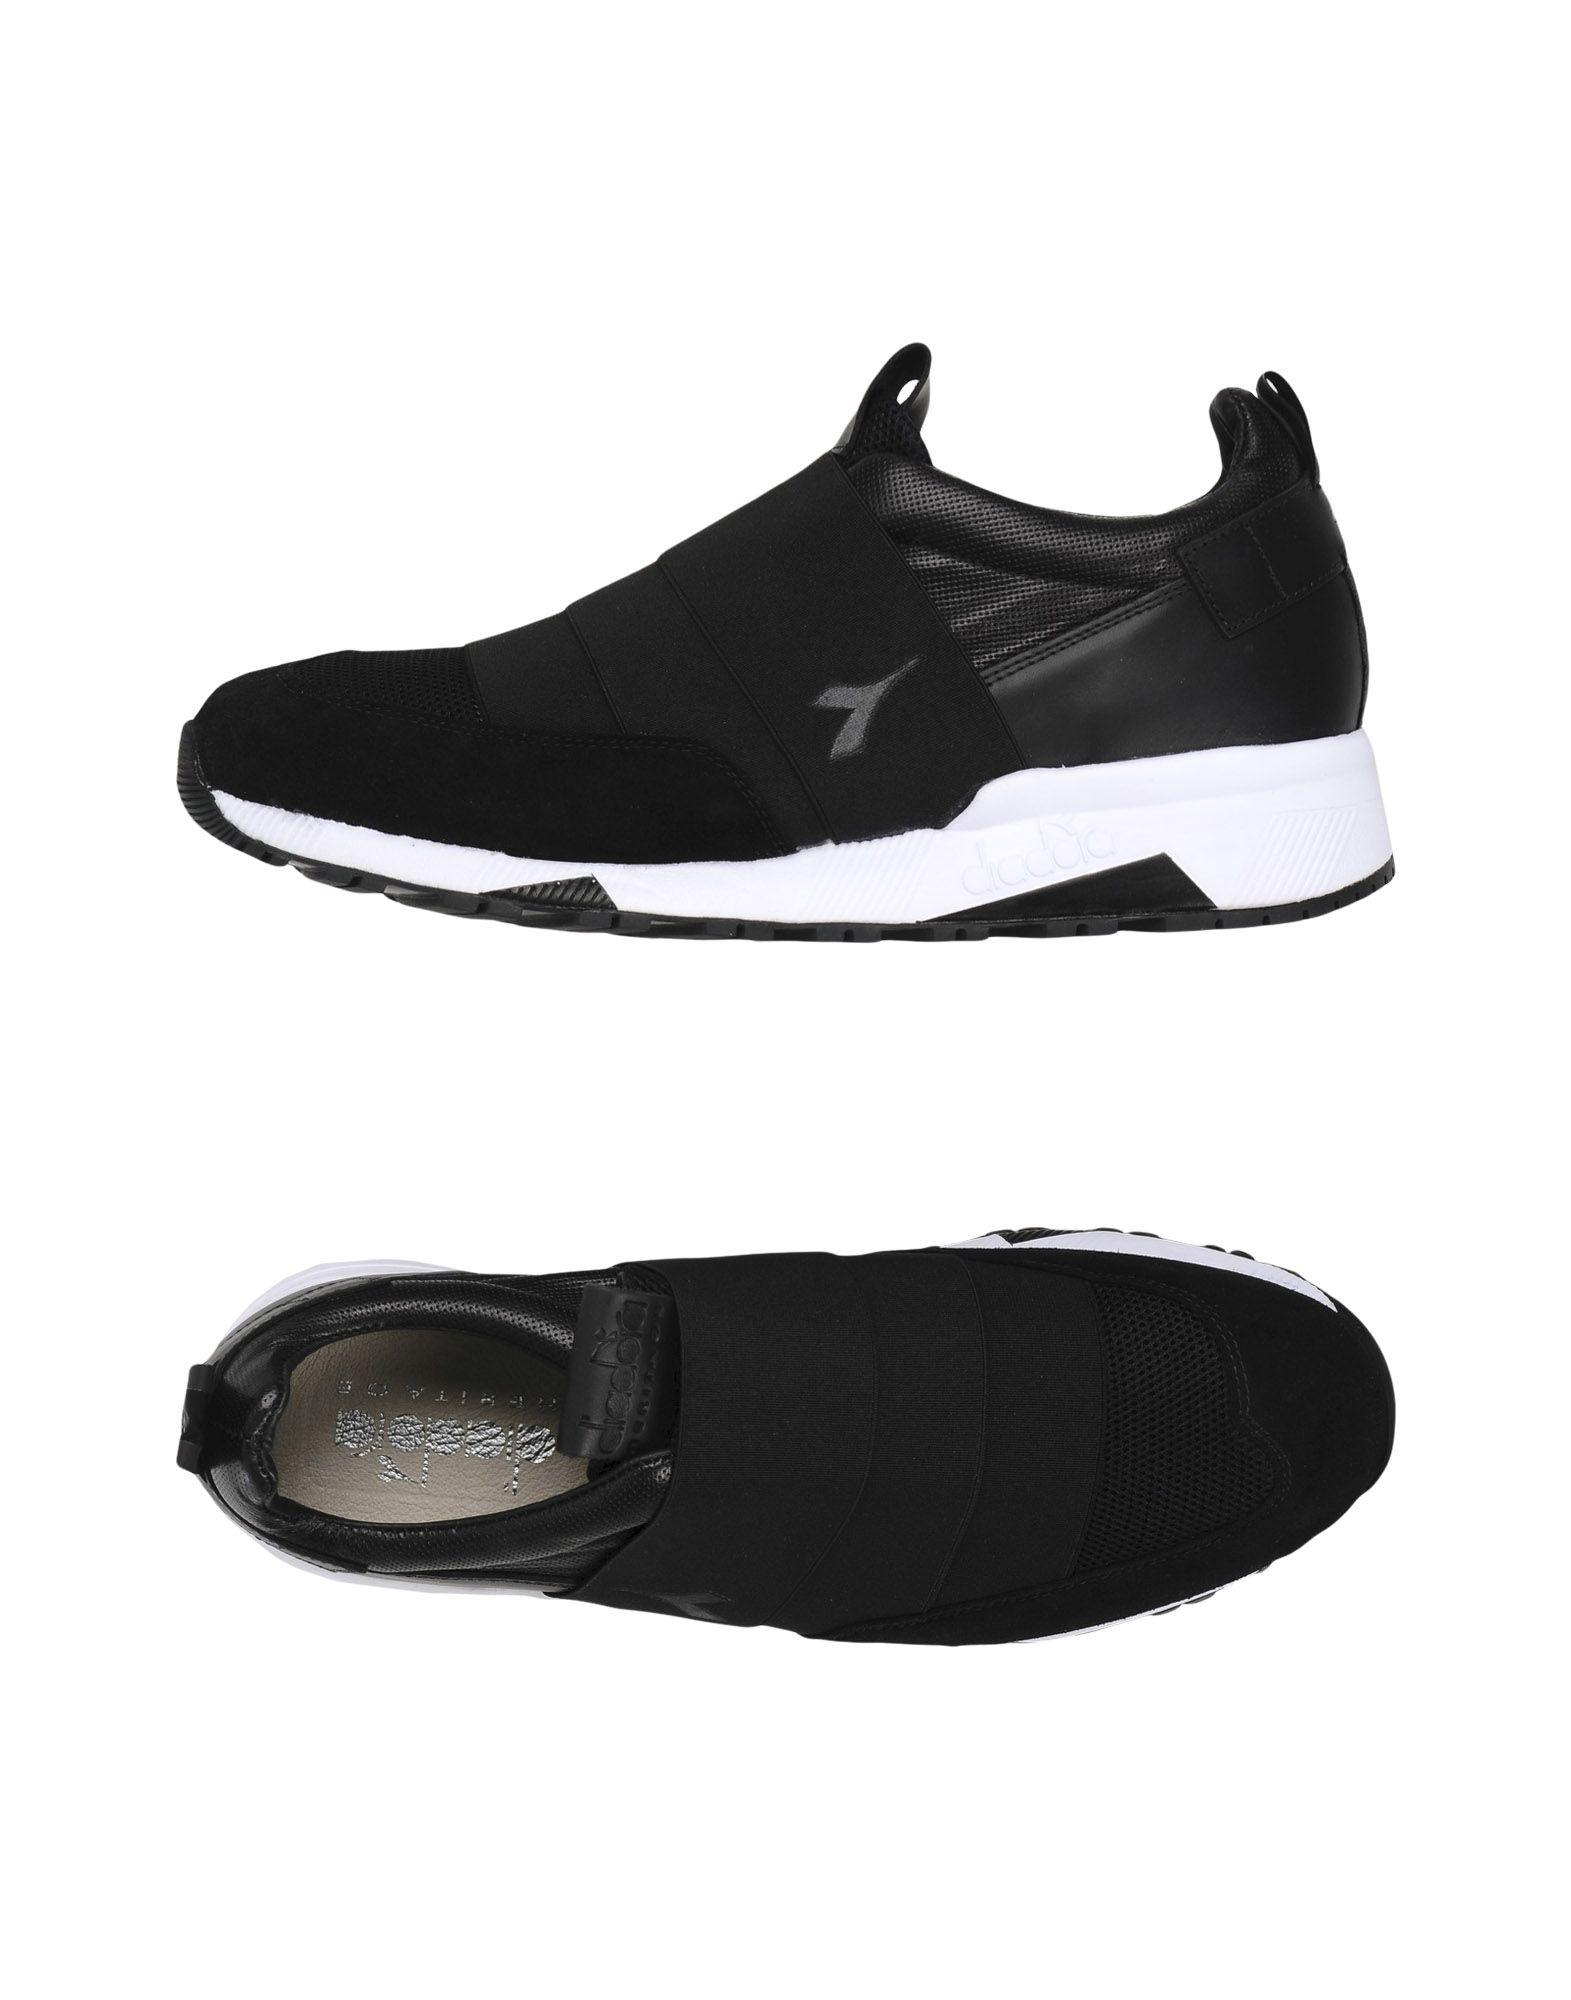 Sneakers Diadora Heritage N9000 H Ita Design - Uomo - Acquista online su